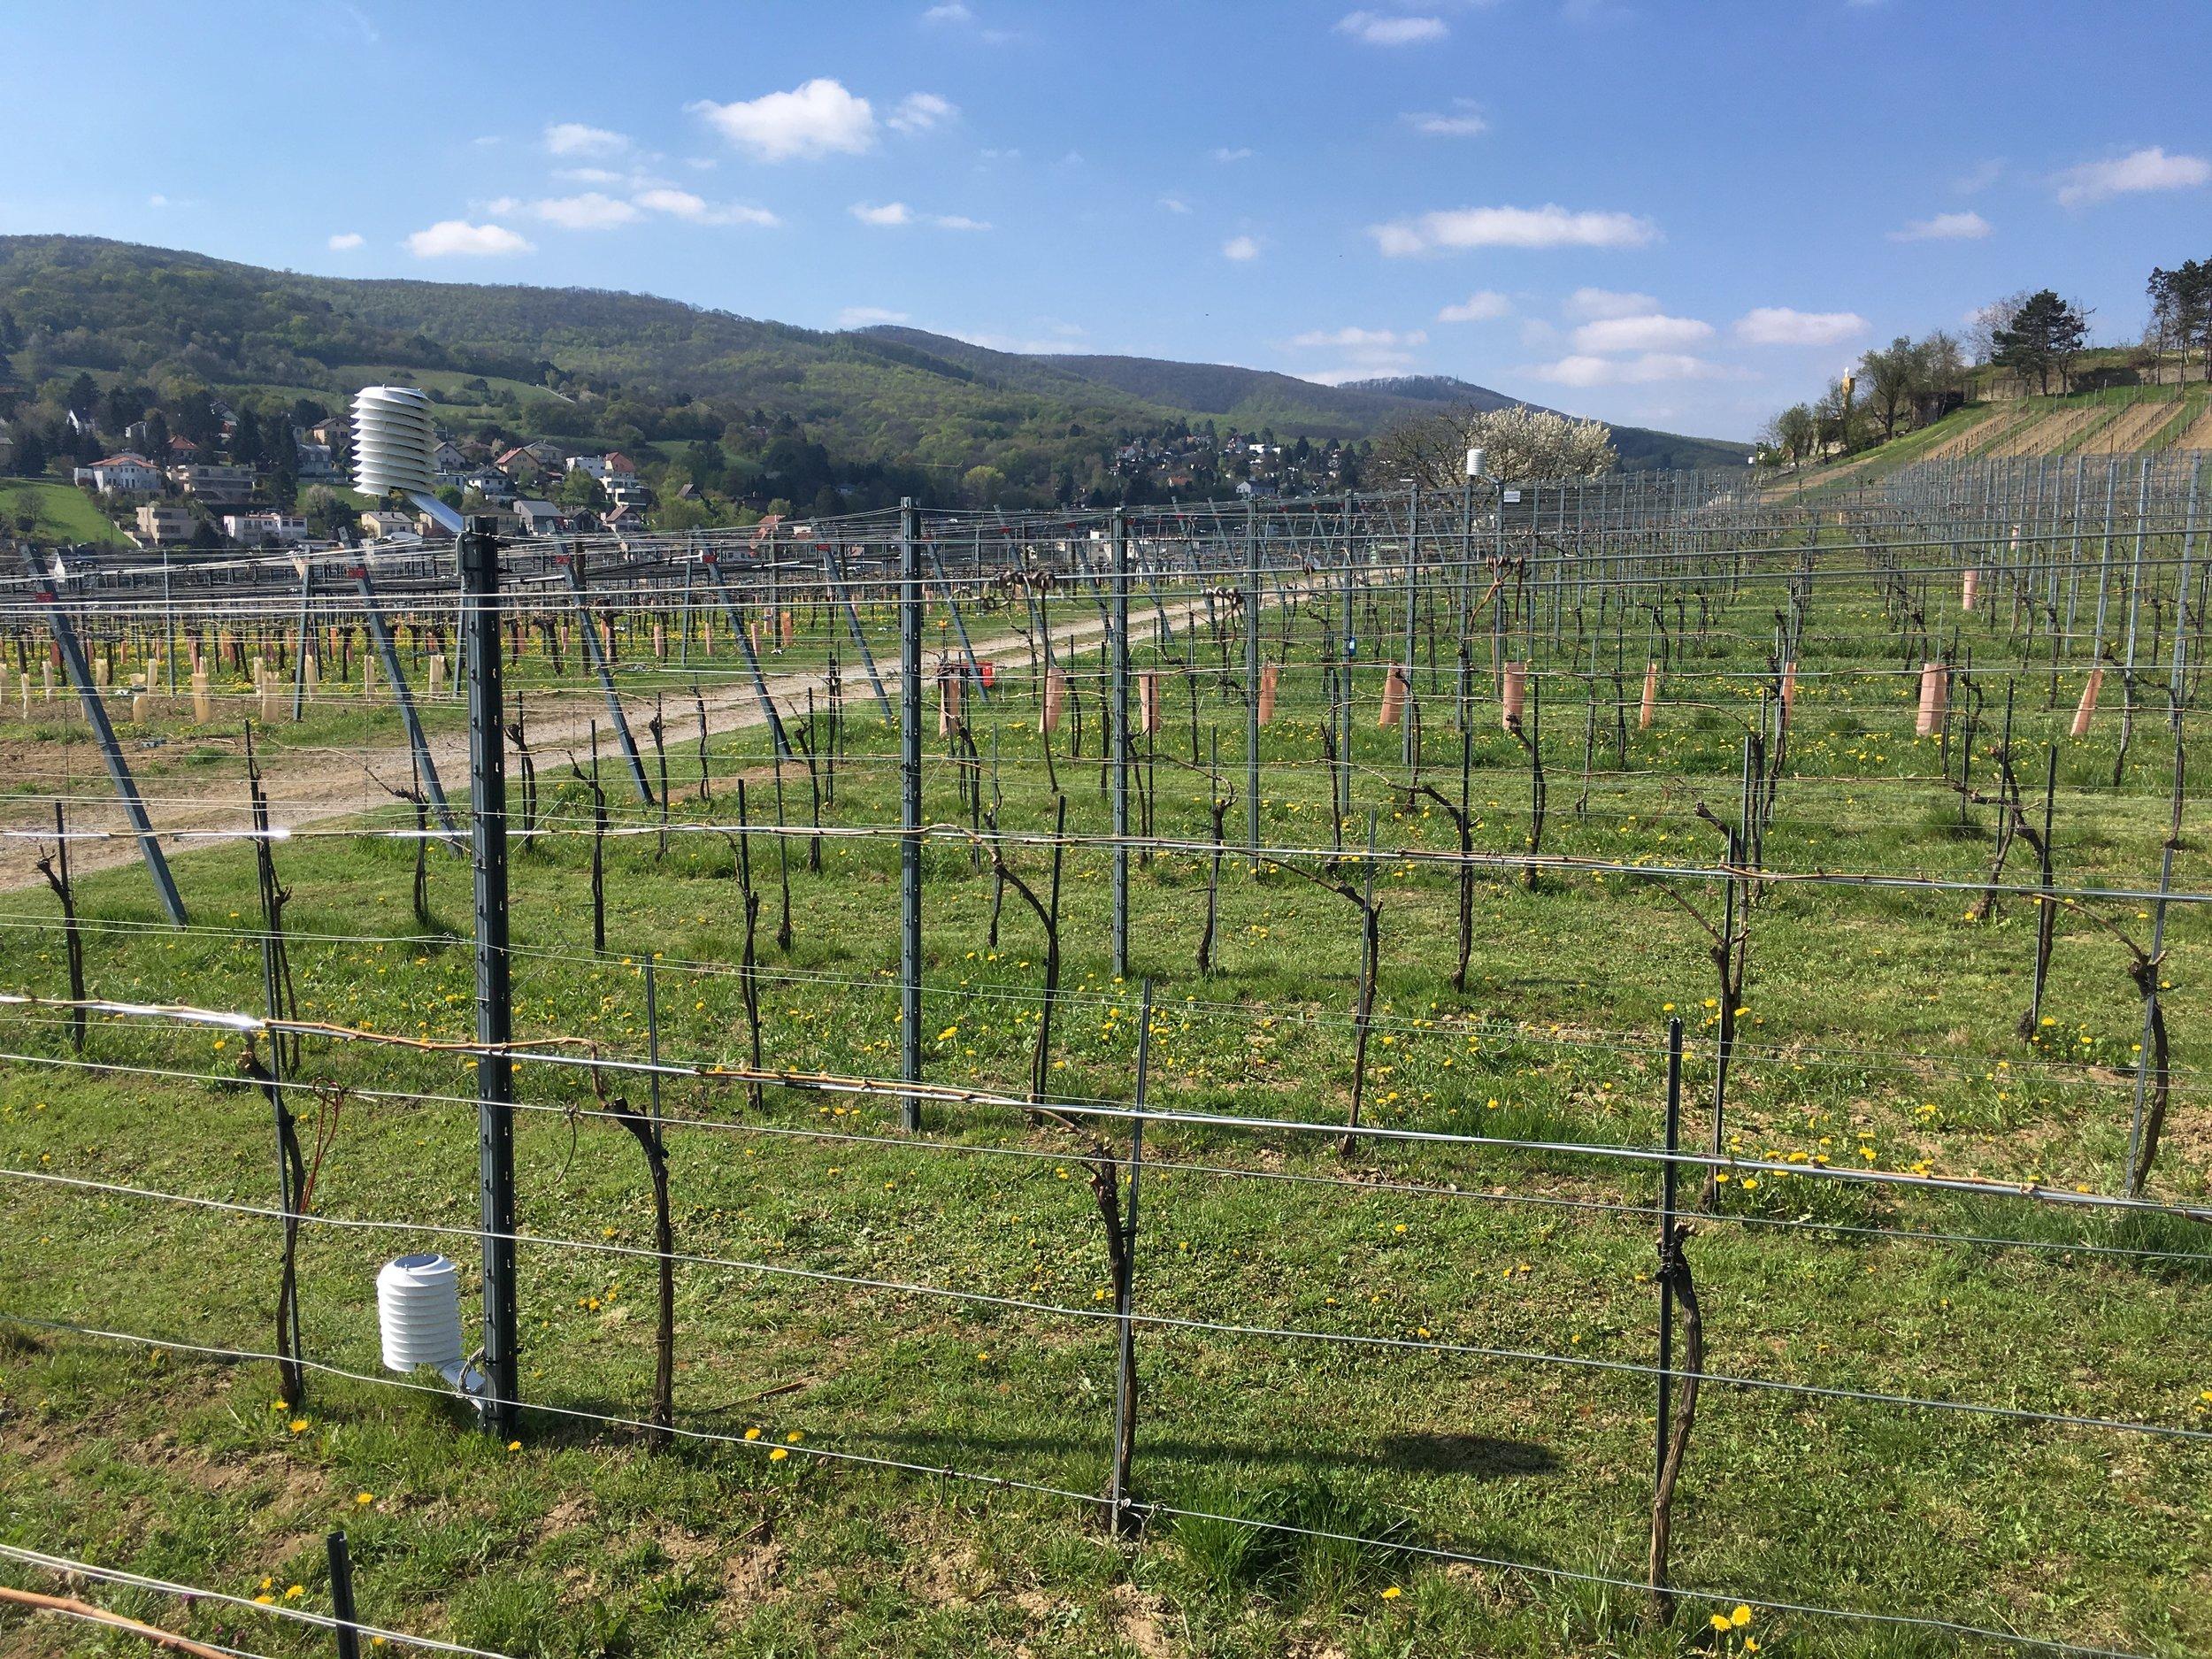 MeteoHelix weather stations monitoring ground frost in precision viticulture at the Höhere Bundeslehranstalt school in Klosterneuburg near Vienna, Austria.